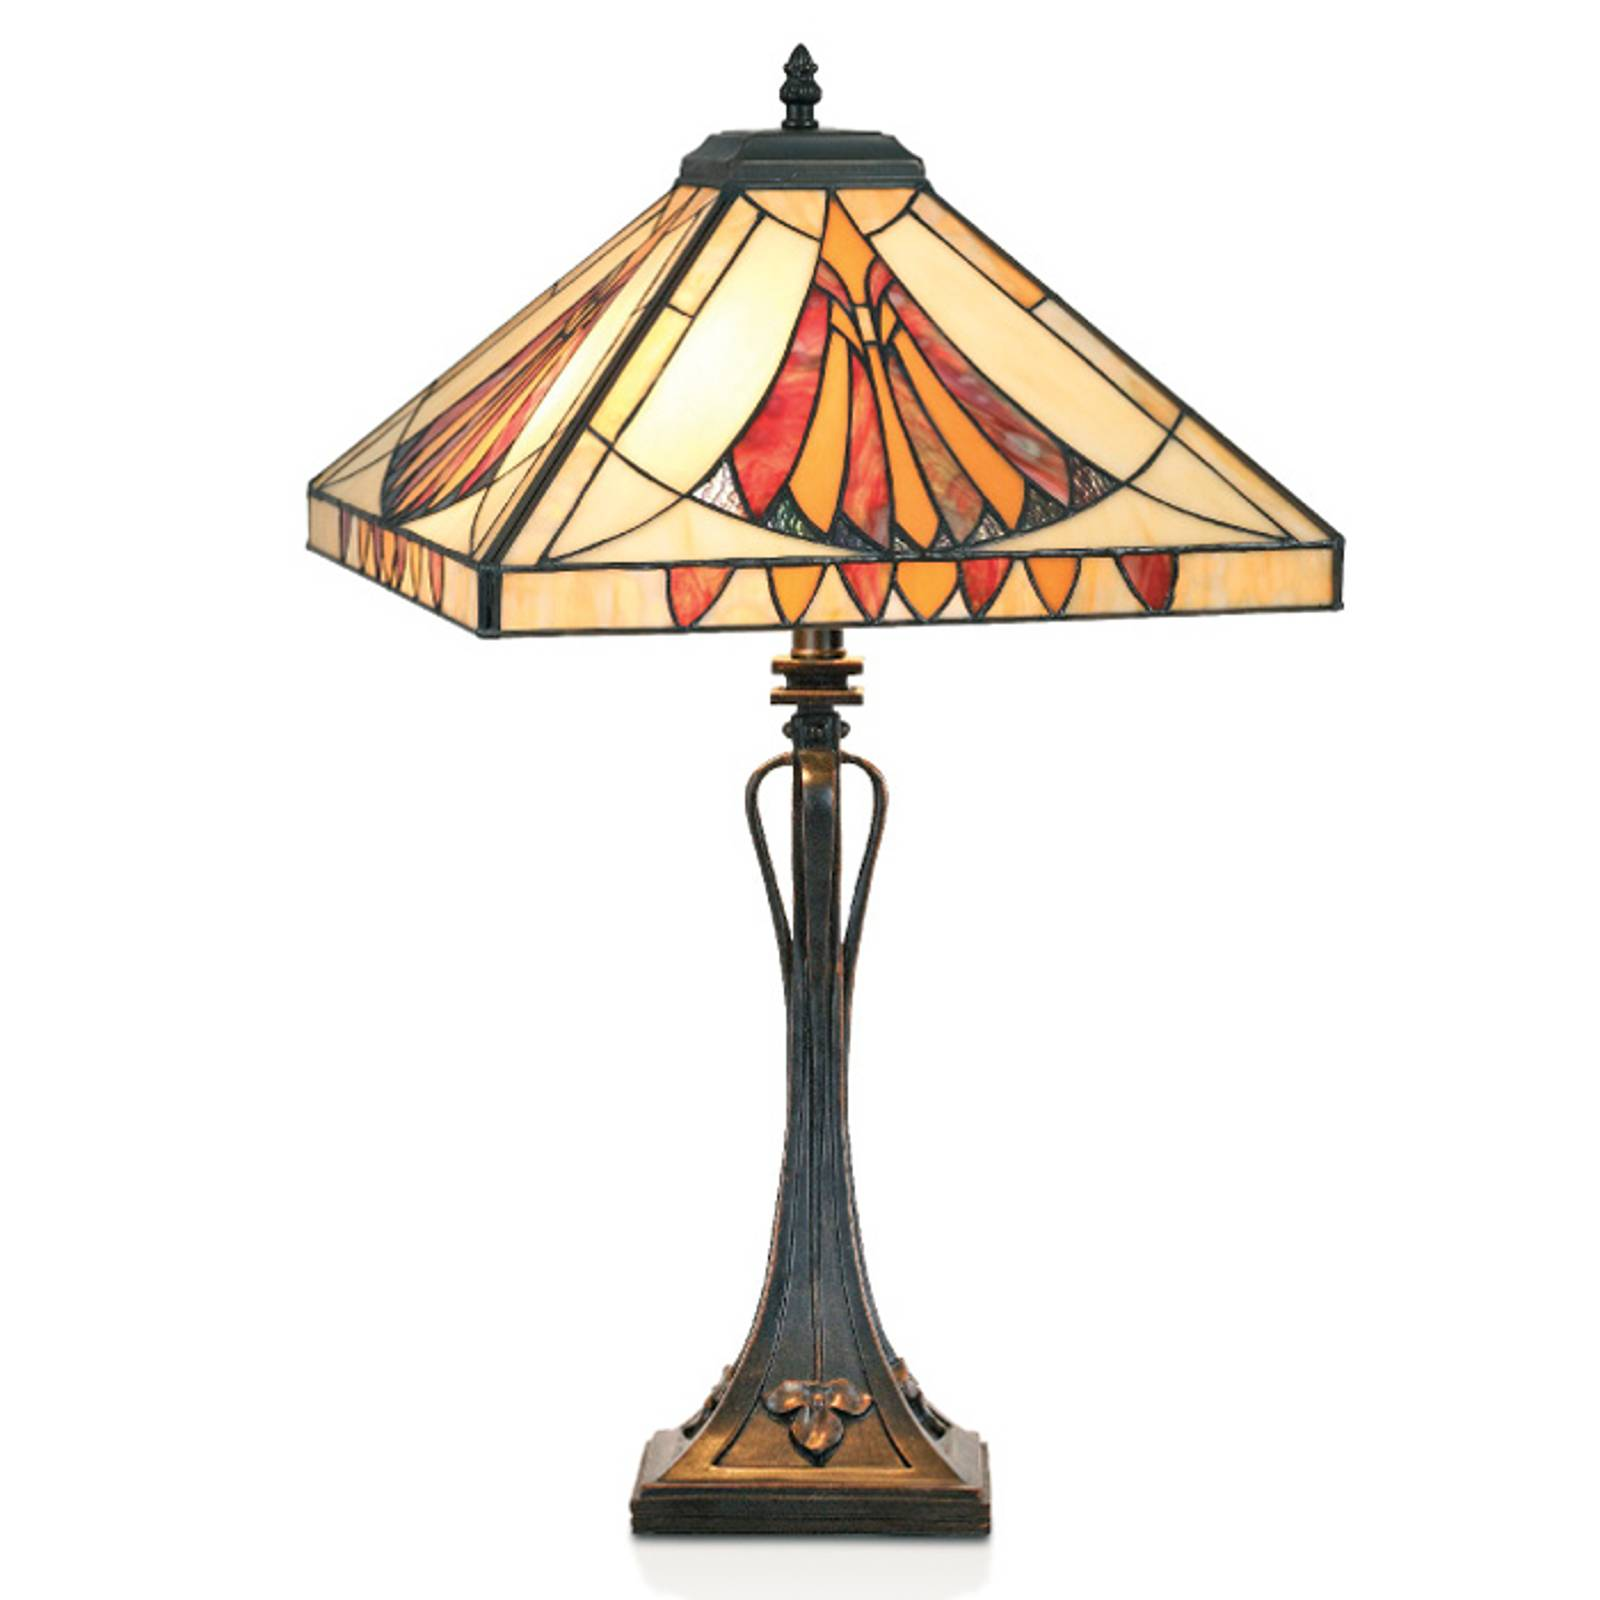 Sierlijke tafellamp AMALIA in Tiffany-stijl